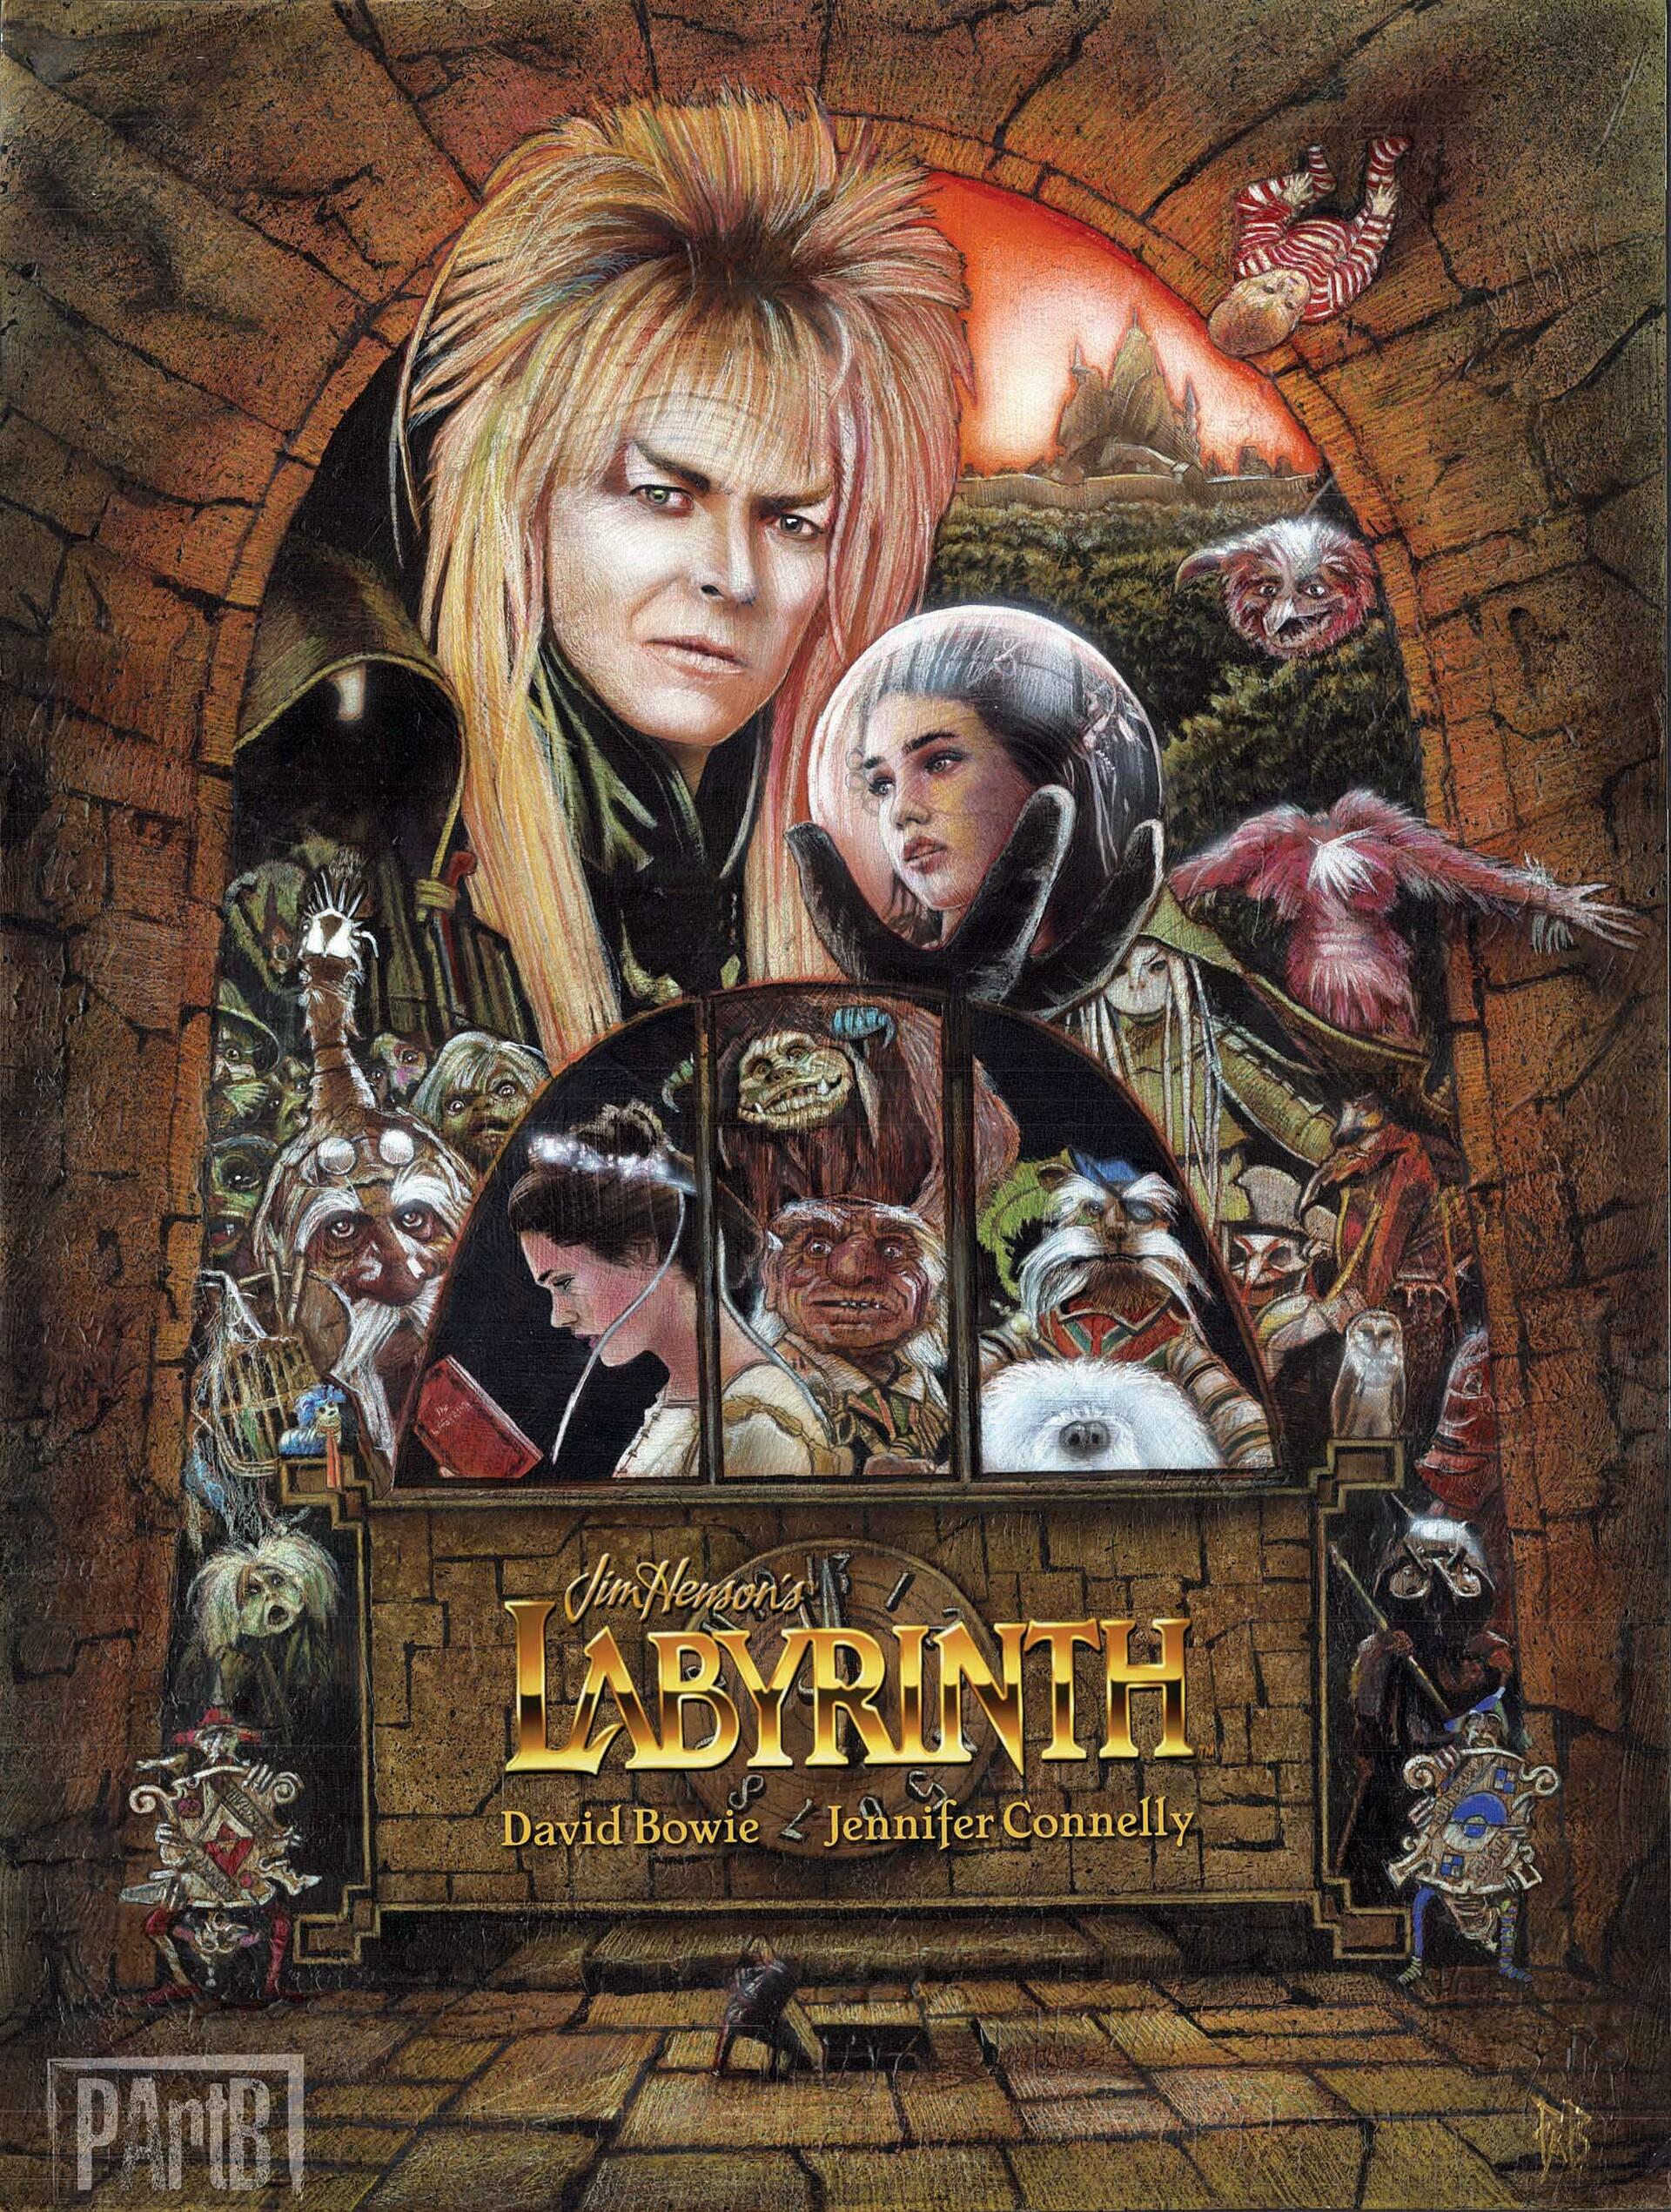 ArtStation - Labyrinth (1986) fan art poster, Paul Butcher